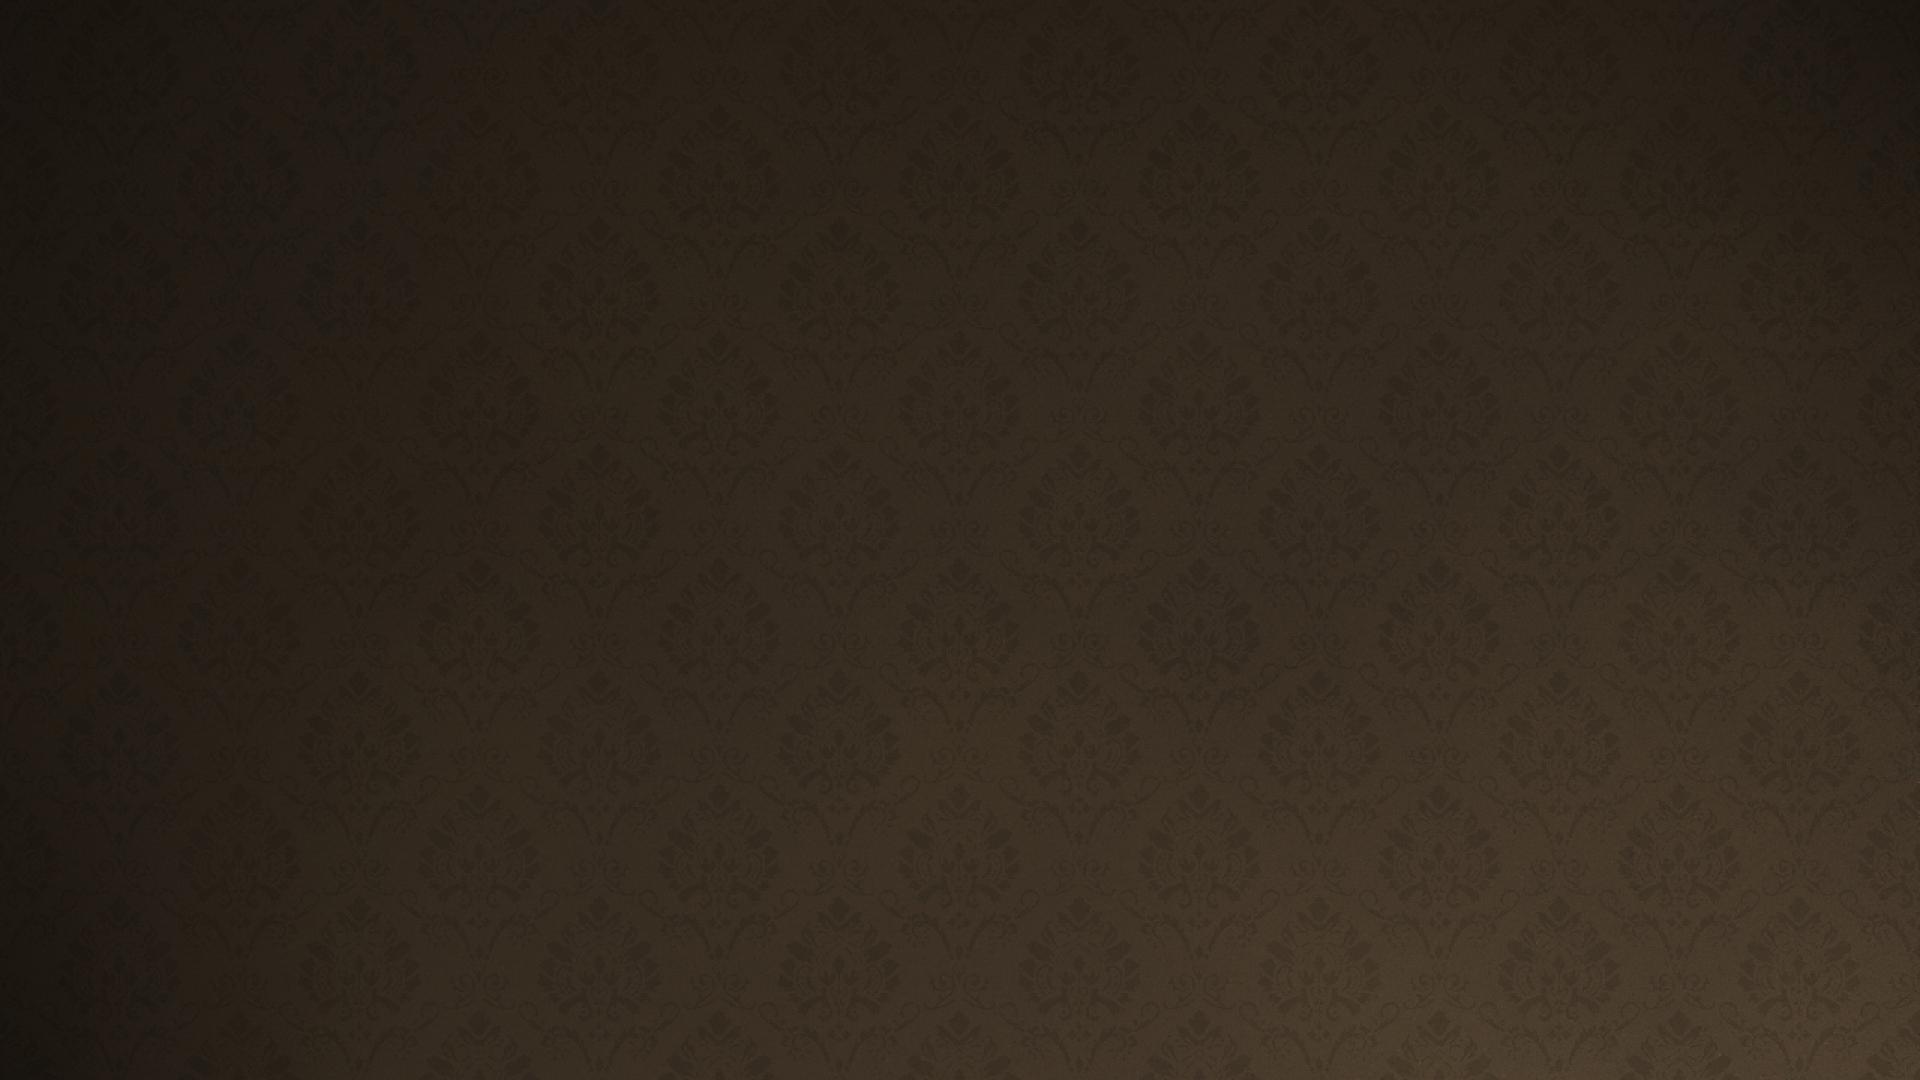 Download brown pattern minimal wallpaper HD wallpaper 1920x1080